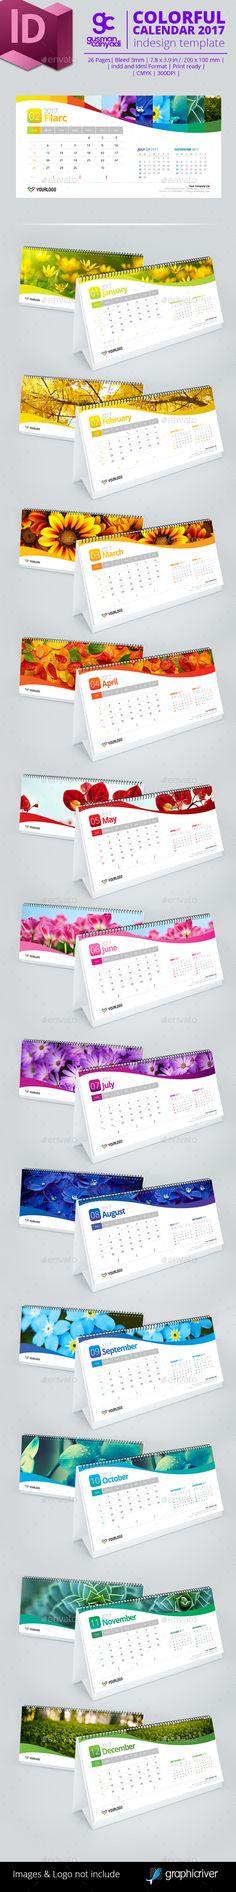 Colorful Calendar 2017 - Calendars Stationery